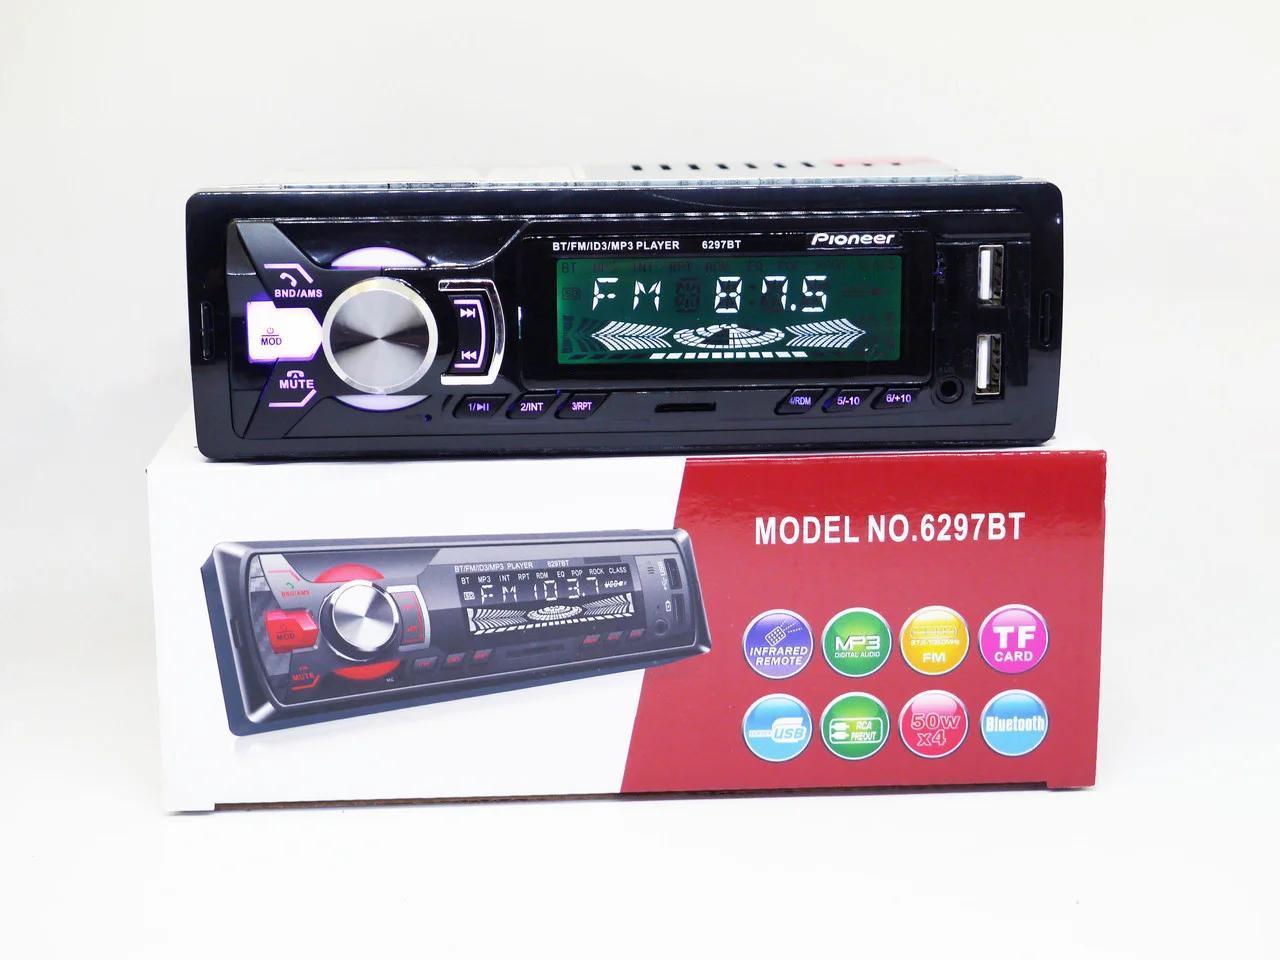 Автомагнитола Pioneer 6297BT с 2 USB (магнитола пионер с Bluetooth и 2 ЮСБ выхода) (copy) +ПОДАРОК!